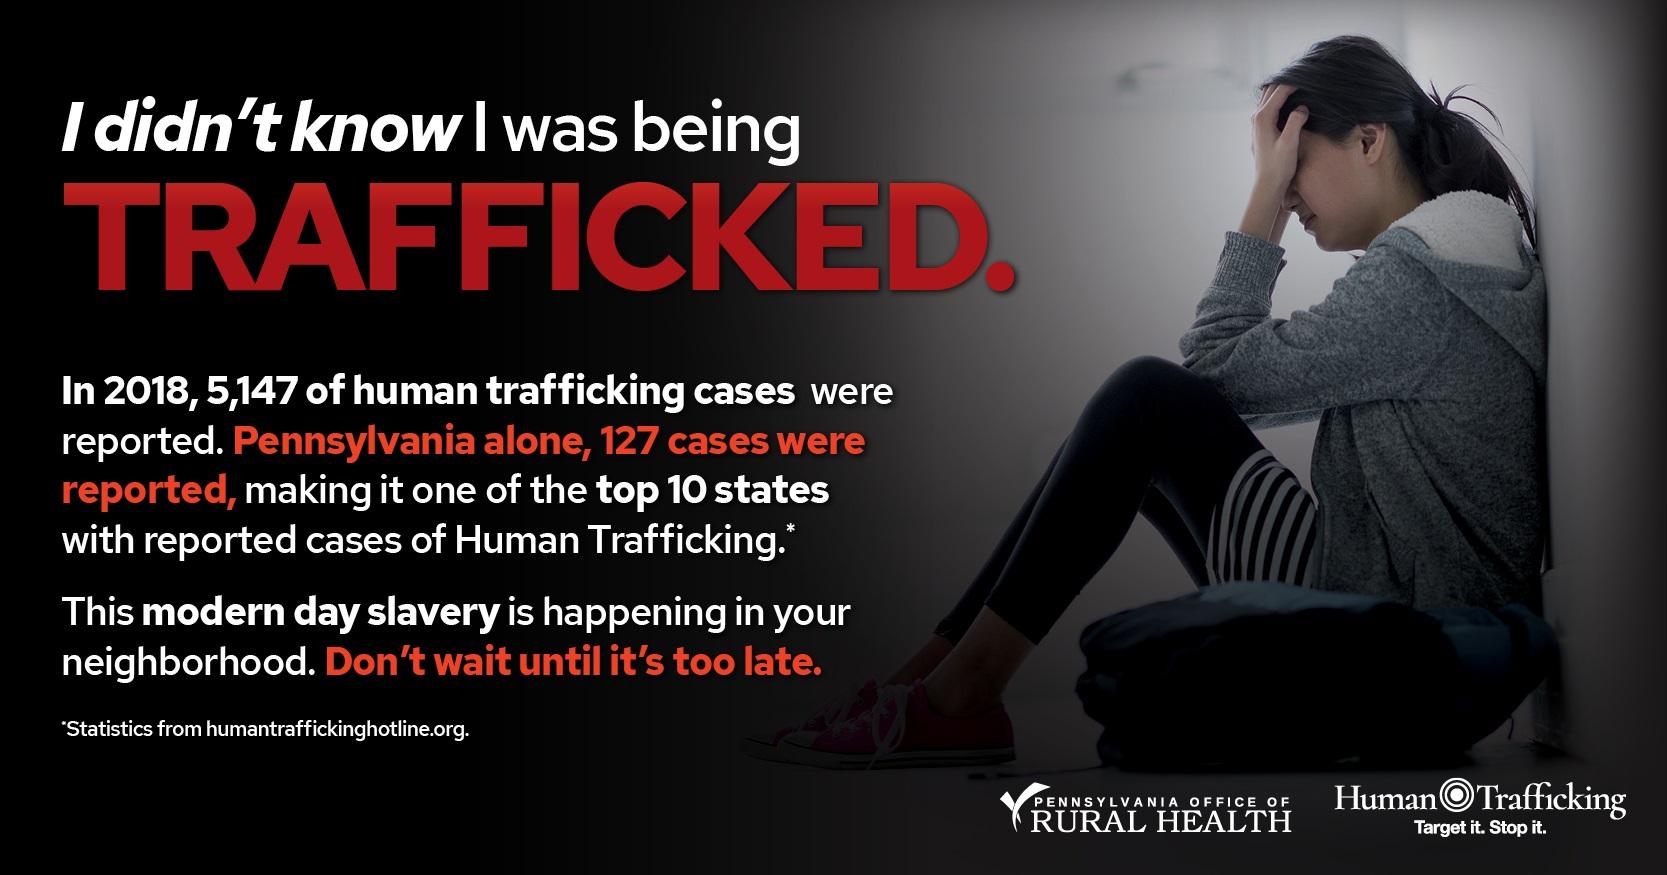 2019 Rural Human Trafficking Summit   Pennsylvania Office of Rural Health